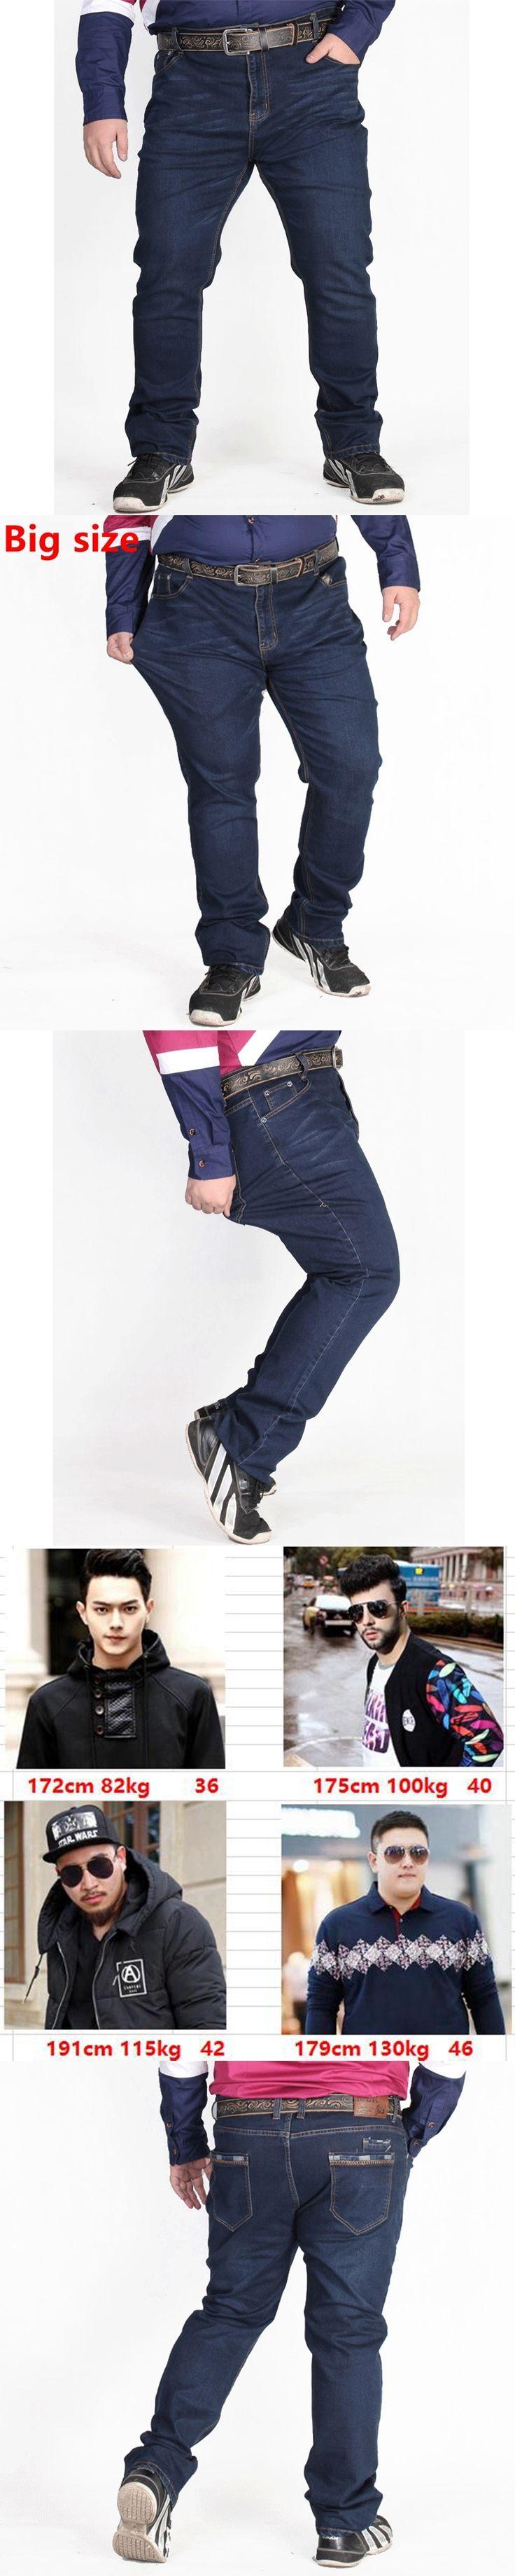 Plus size autumn new fertilizer plus-size men denim pants big and Tall high waist elastic big size nutty dark jeans